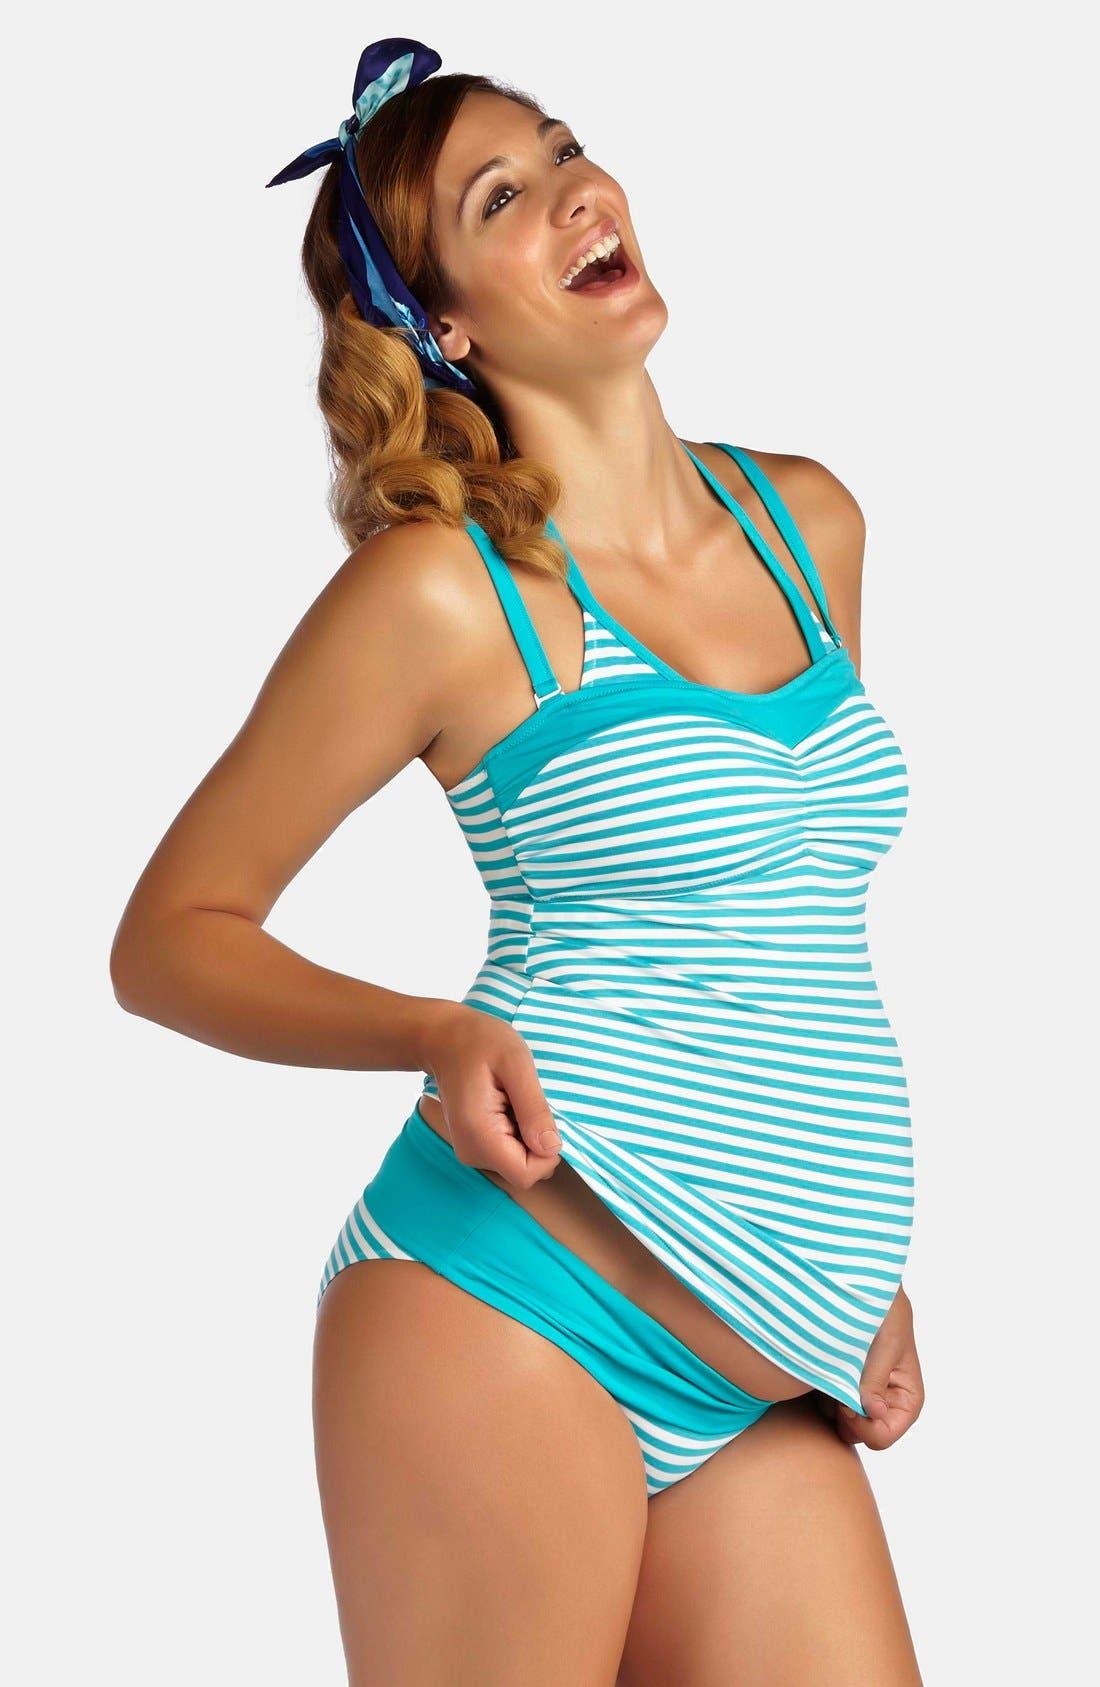 'La Mer' Three-Piece Maternity Swimsuit Set,                             Main thumbnail 1, color,                             420